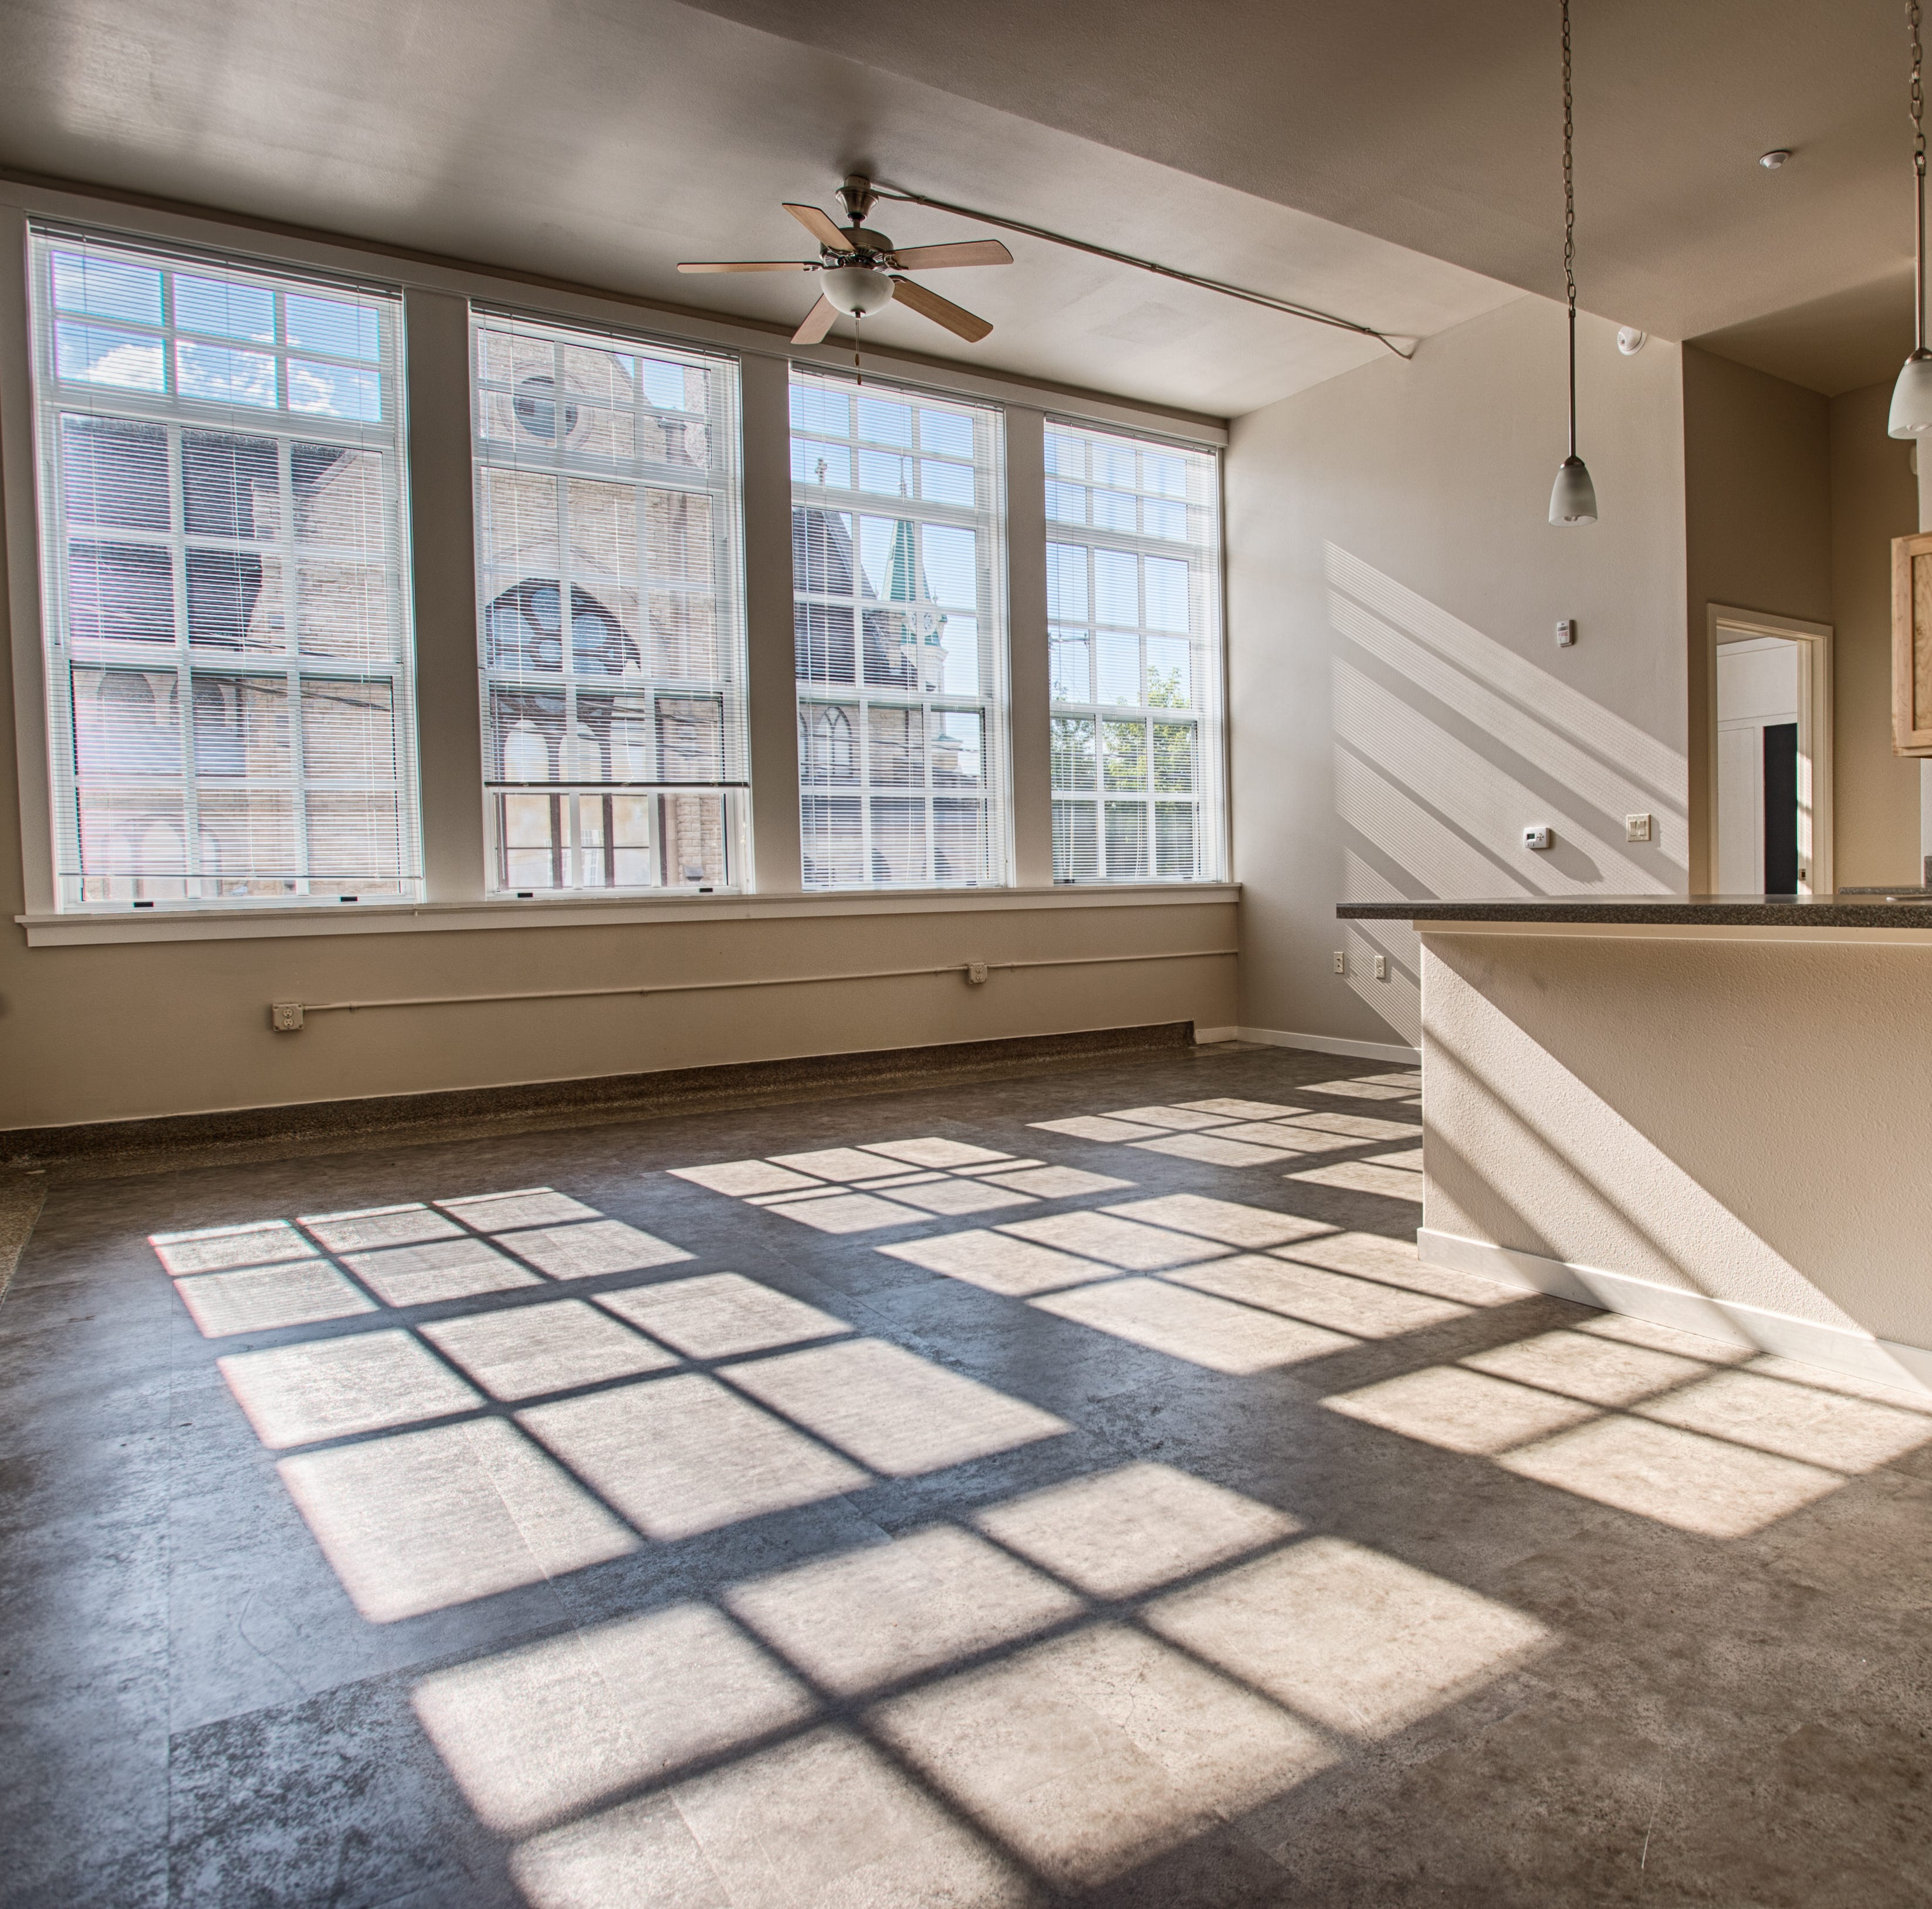 St. Joseph's Parish School Apartments host open house |Streetwise